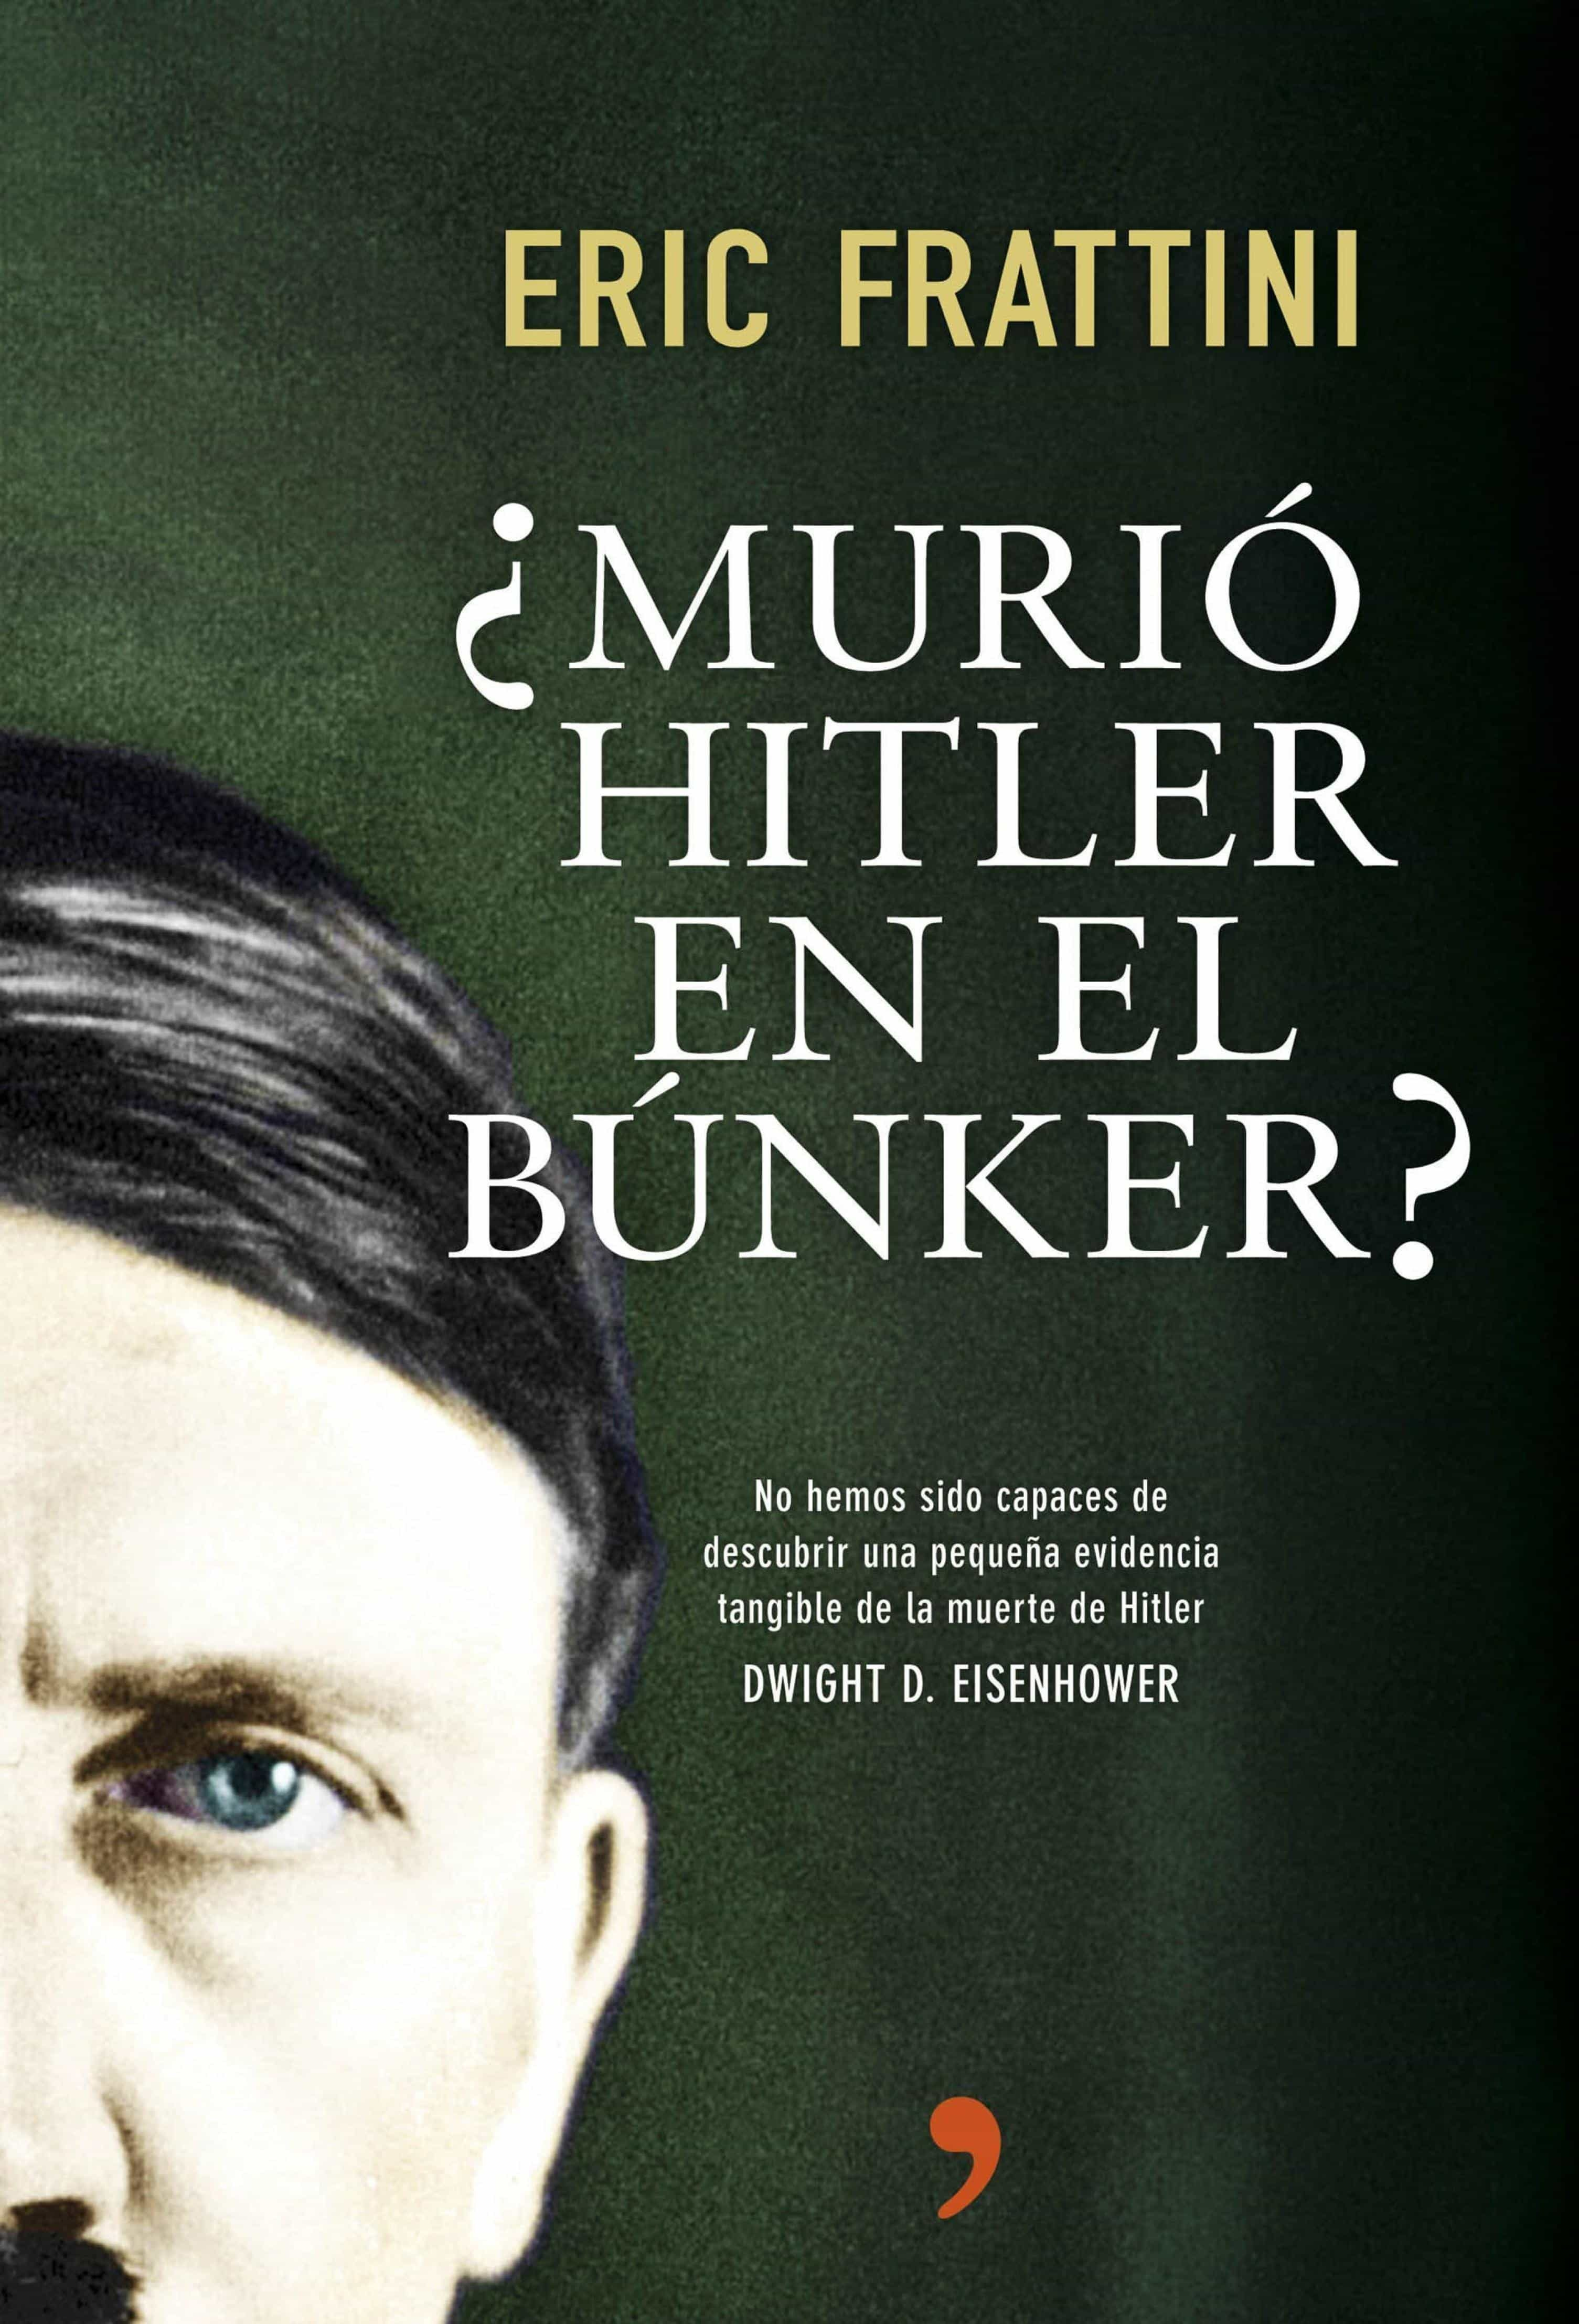 ¿Murió Hitler en el búnker? (ebook)